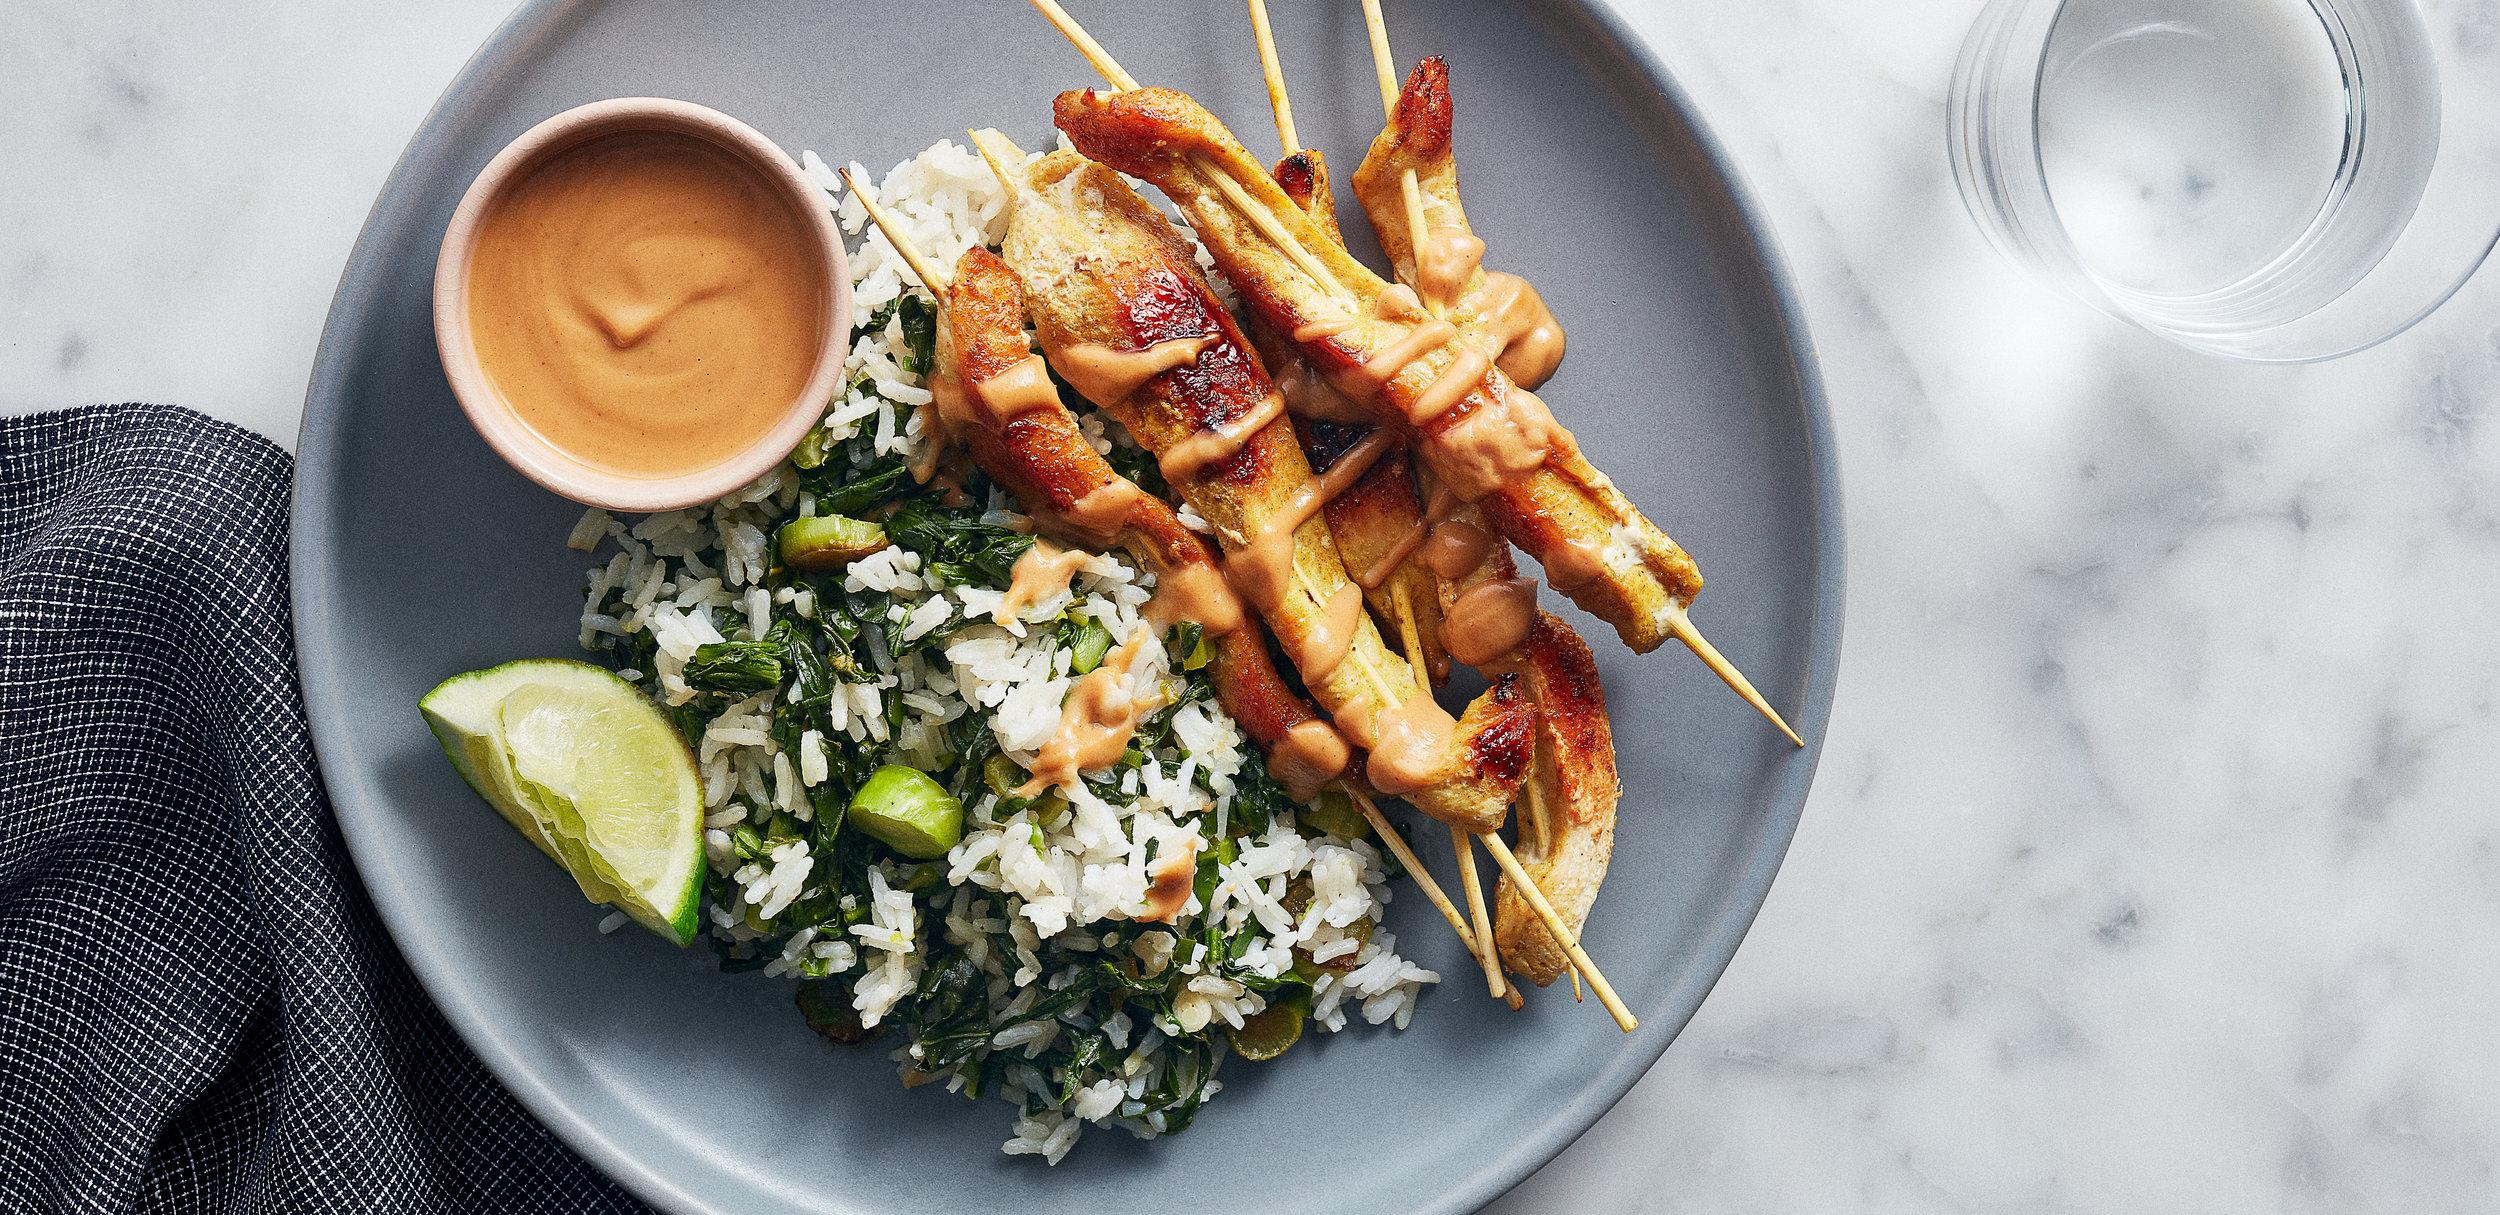 Chicken Satay with Peanut Sauce and Ginger Rice — 0021 — HERO (1).jpg